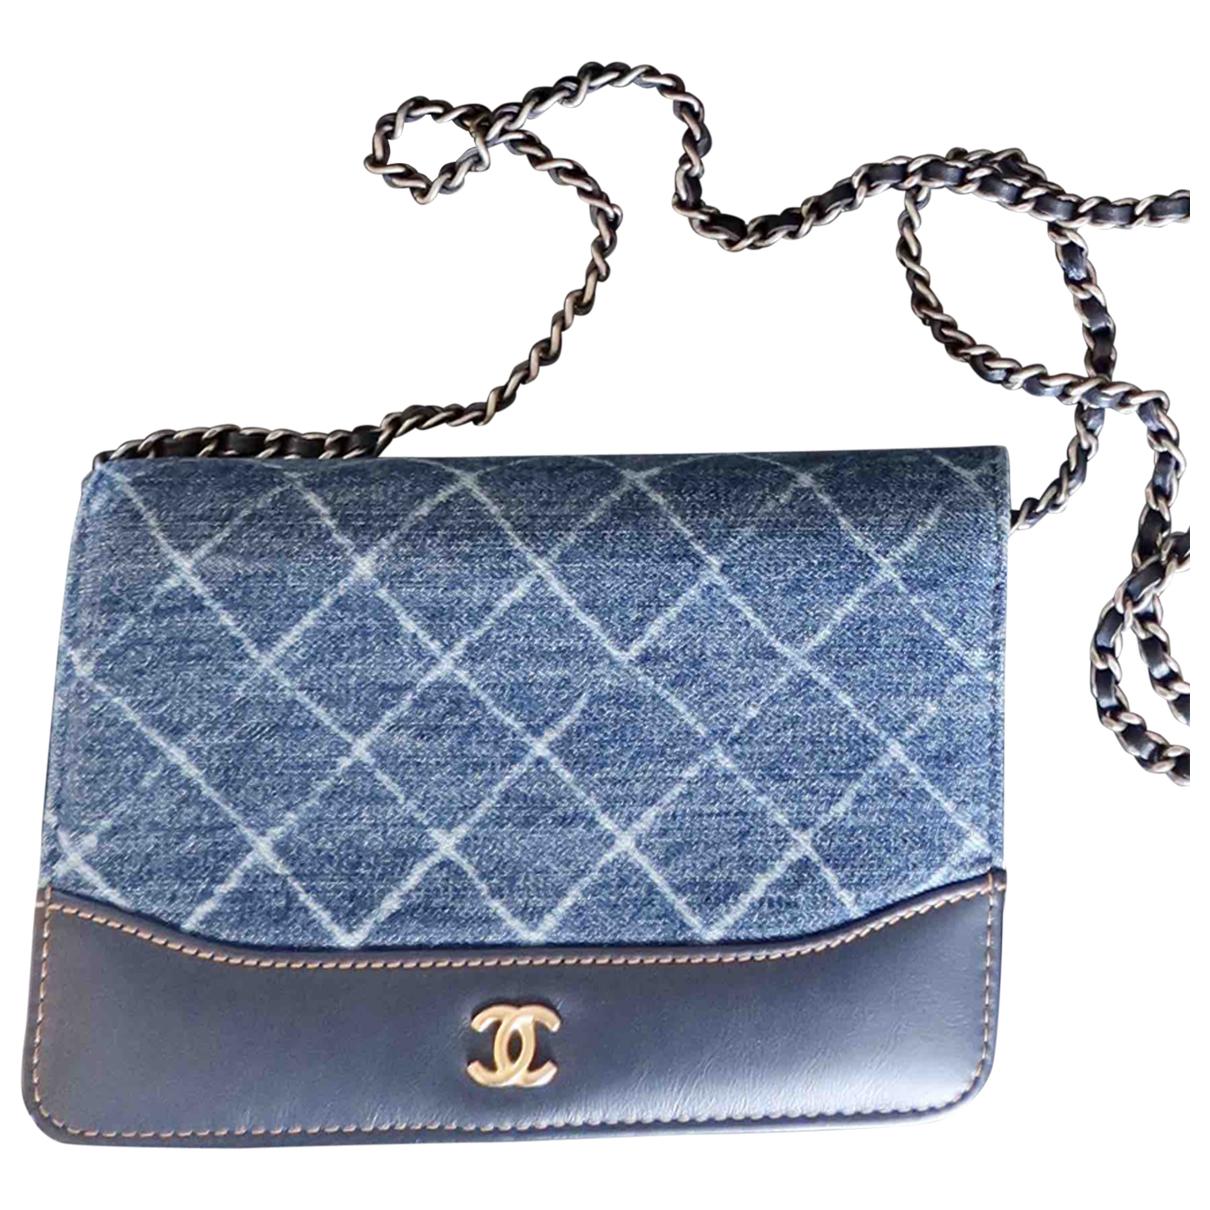 Chanel - Sac a main Wallet on Chain pour femme en denim - bleu